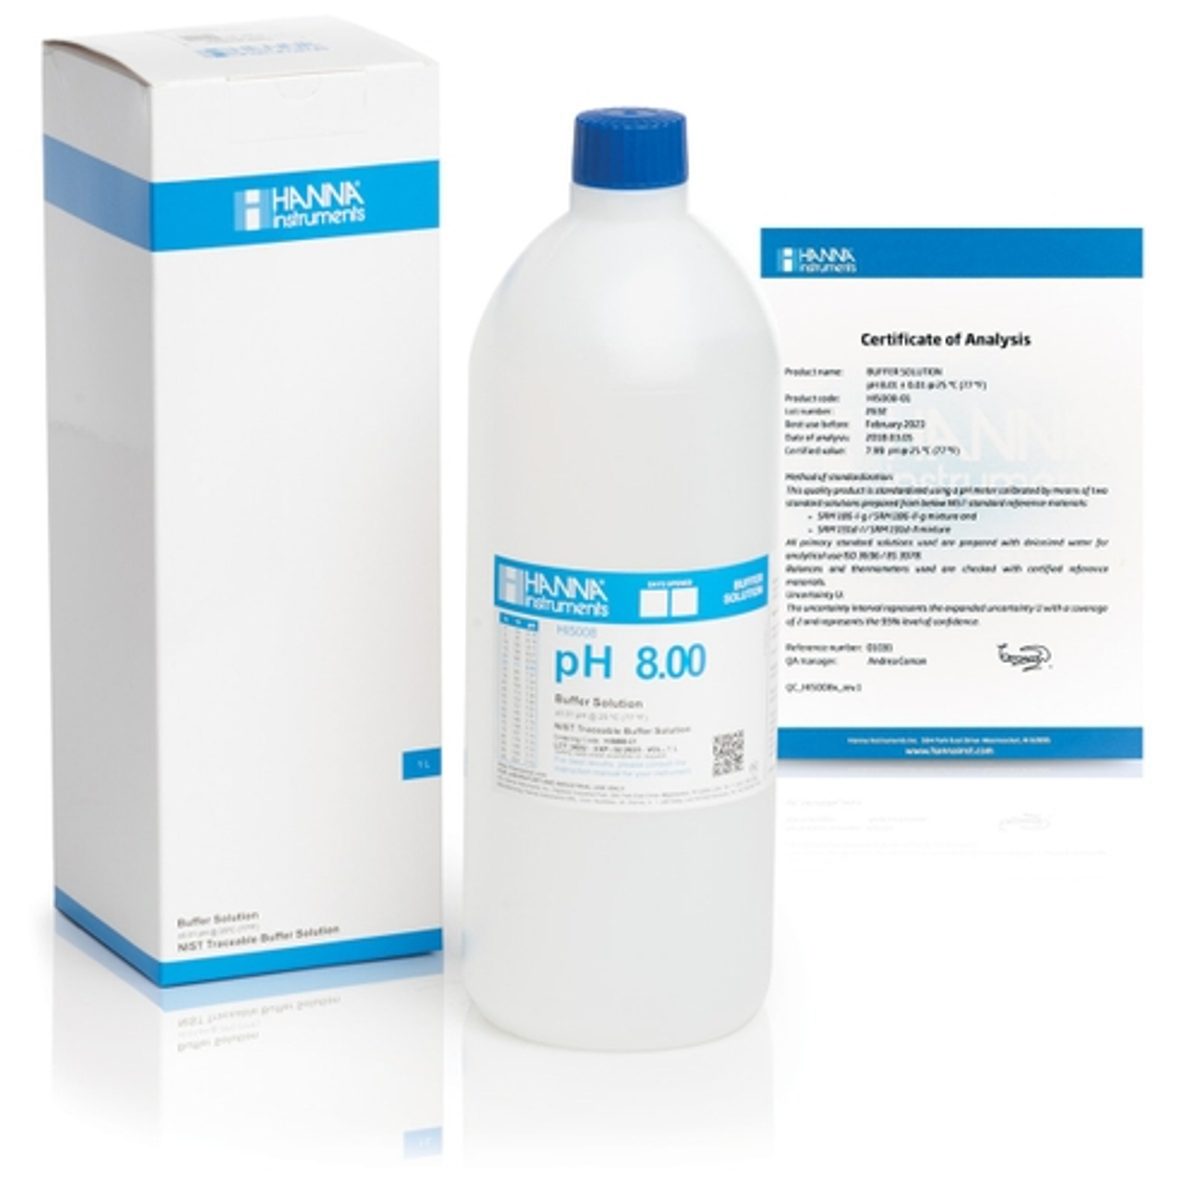 HI5008-01 pH 8.00 Technical Calibration Buffer (1 L)